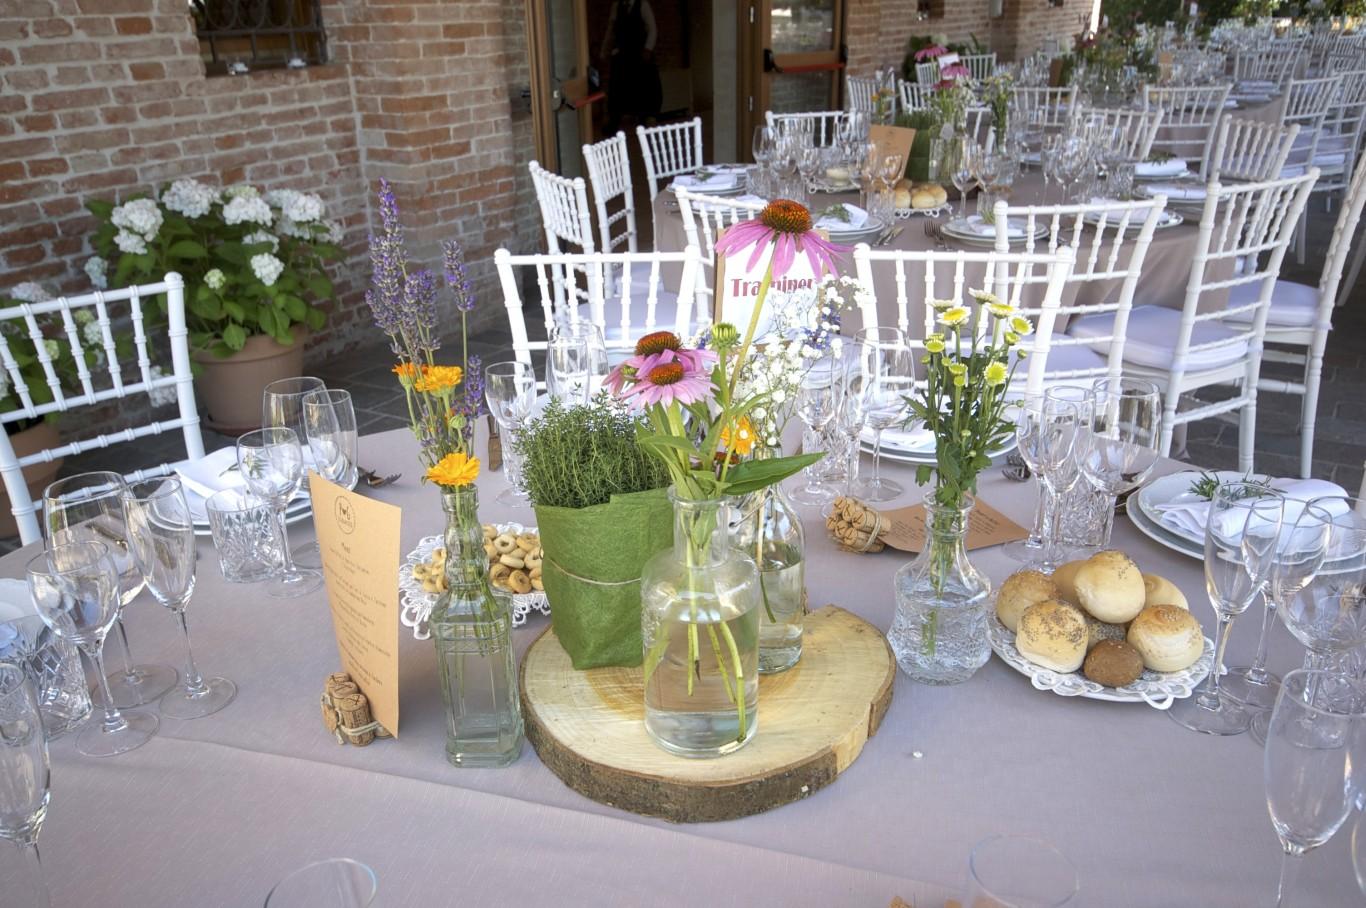 Addobbi Floreali Matrimonio Rustico : Addobbi floreali matrimonio e addobbi per cerimonie casa tormene